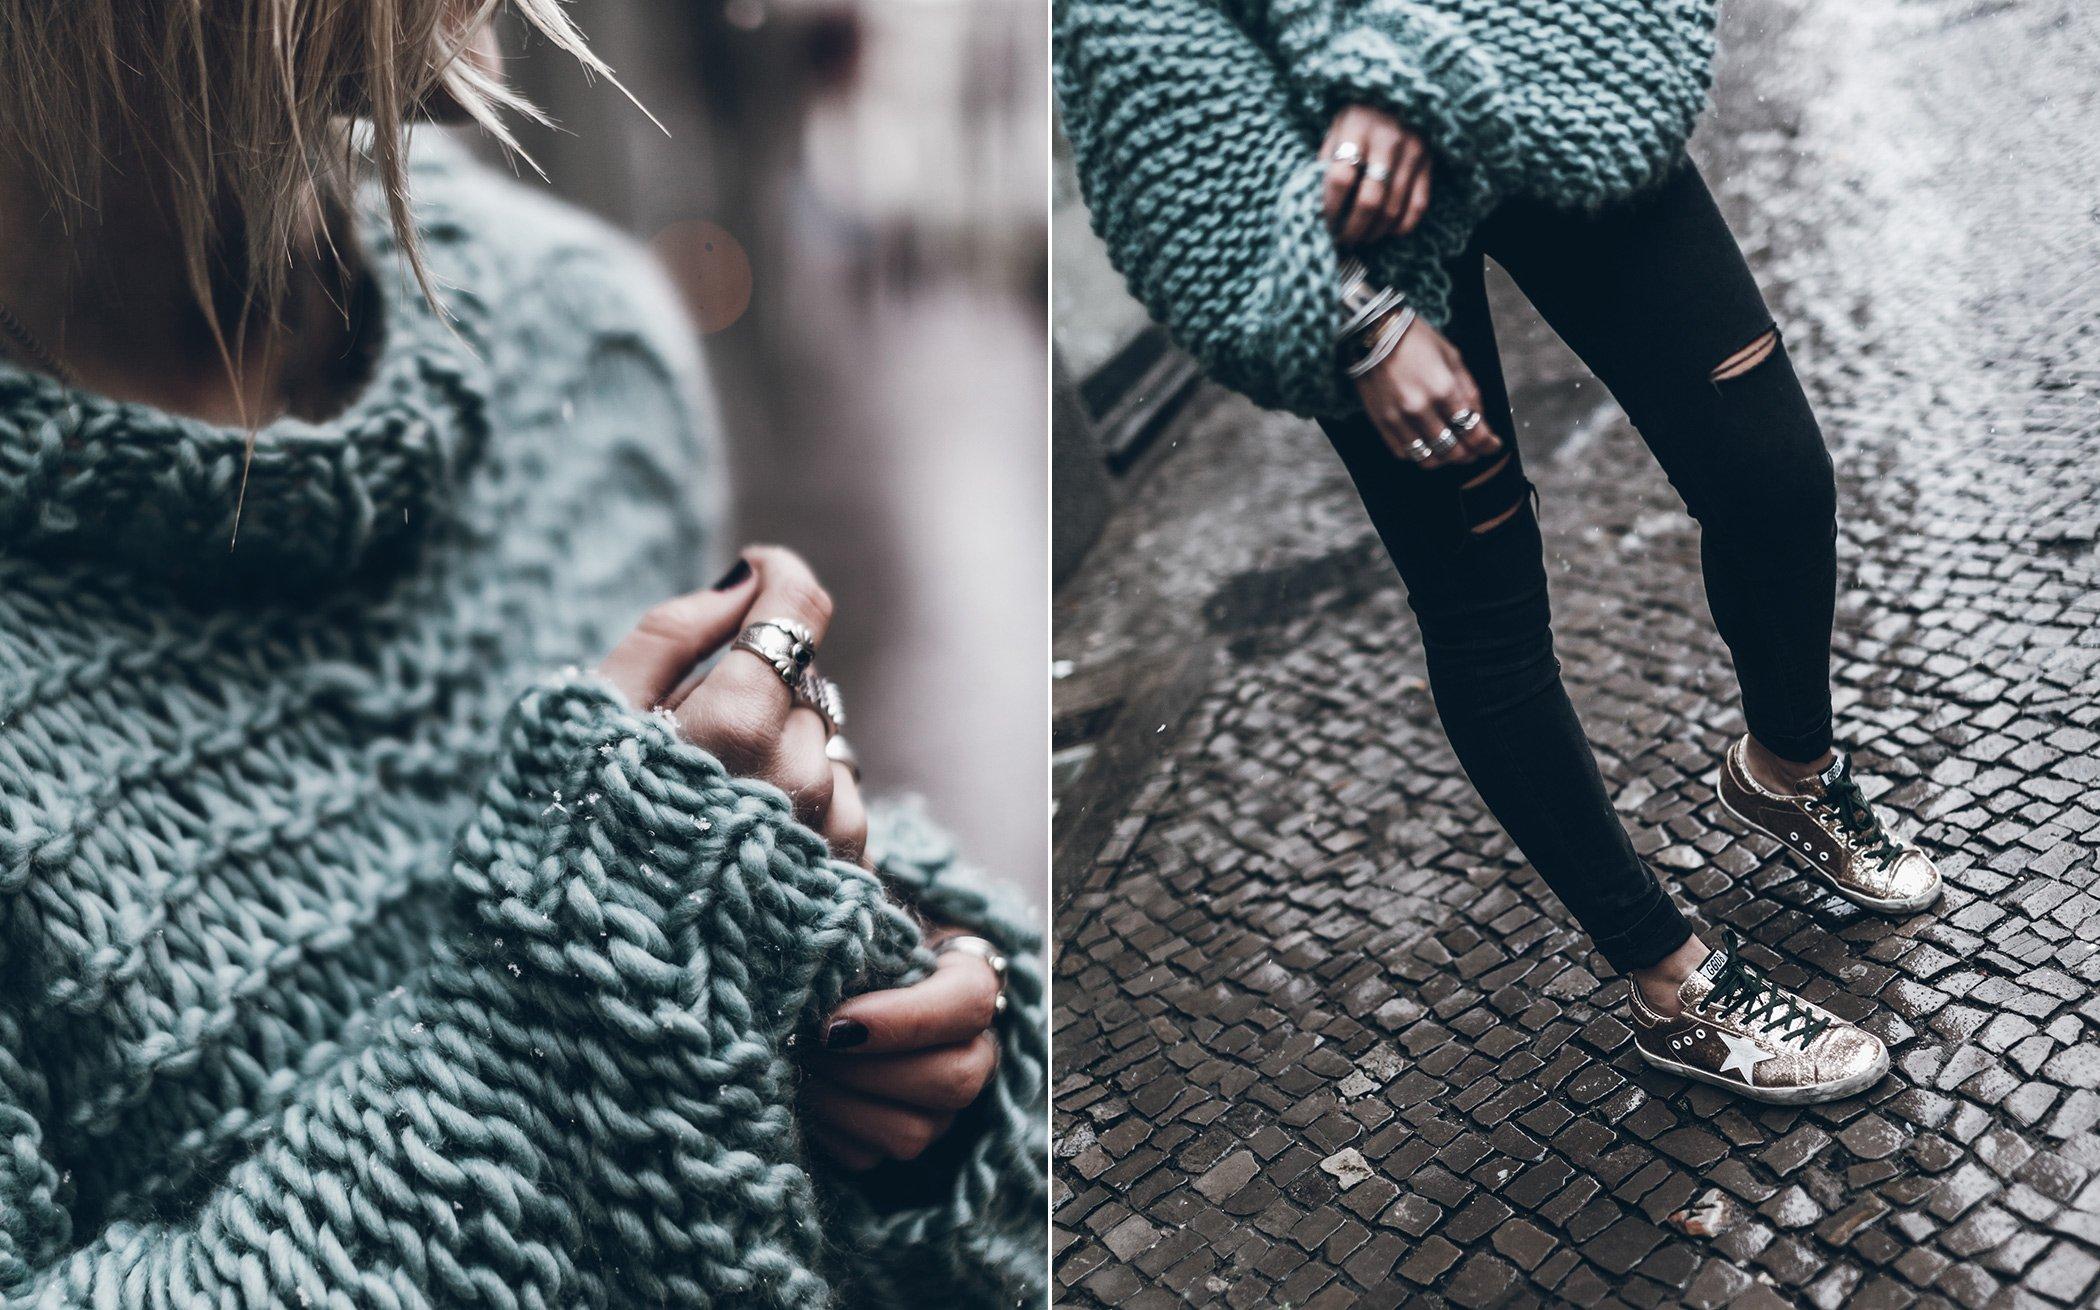 mikuta-green-selfmade-miku-knit-23